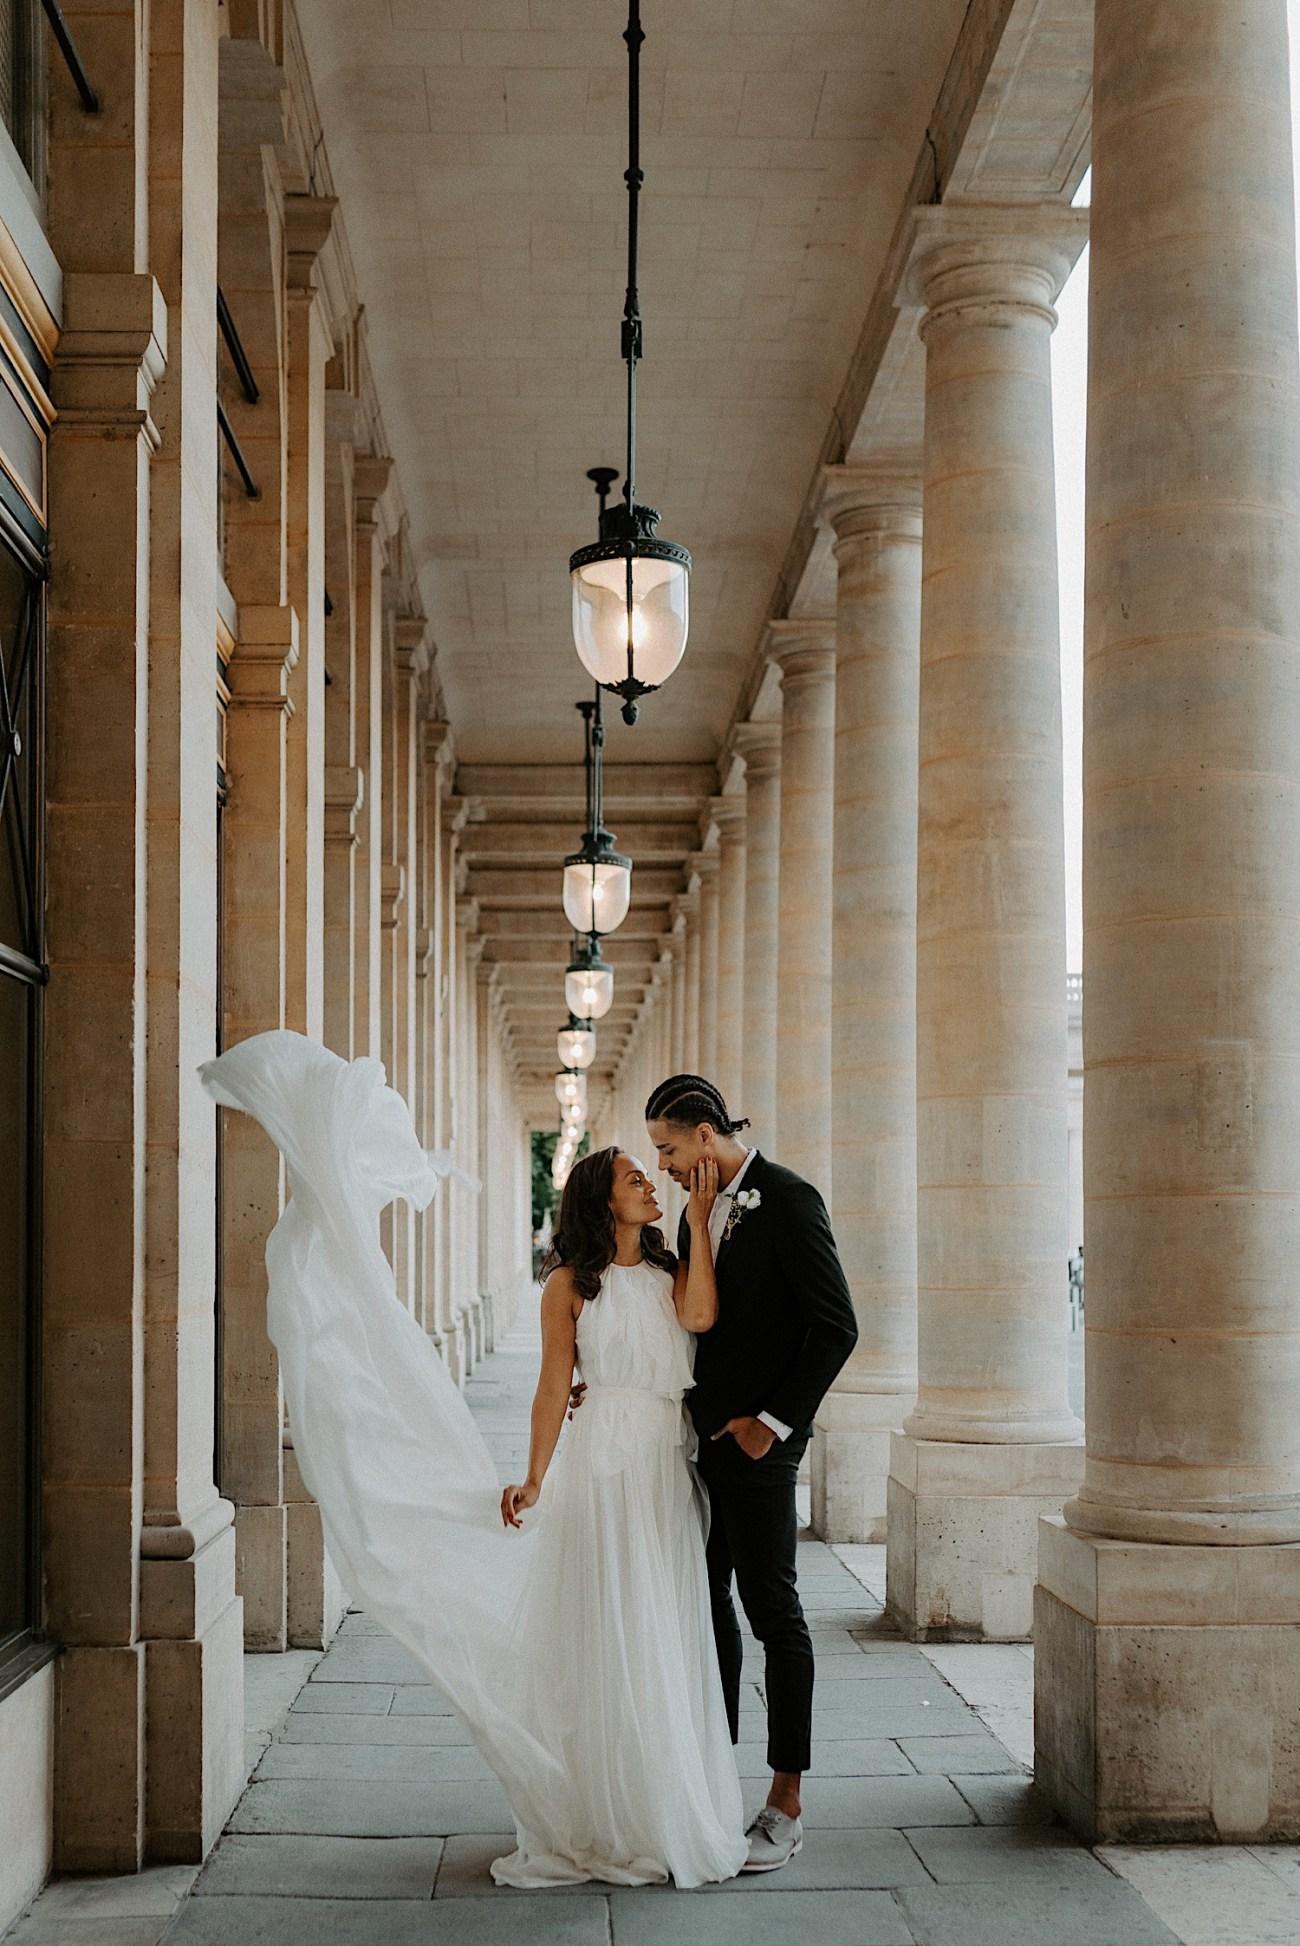 Paris Louvre Wedding Photos Paris Wedding Photographer Destination Wedding France Anais Possamai Photography 04